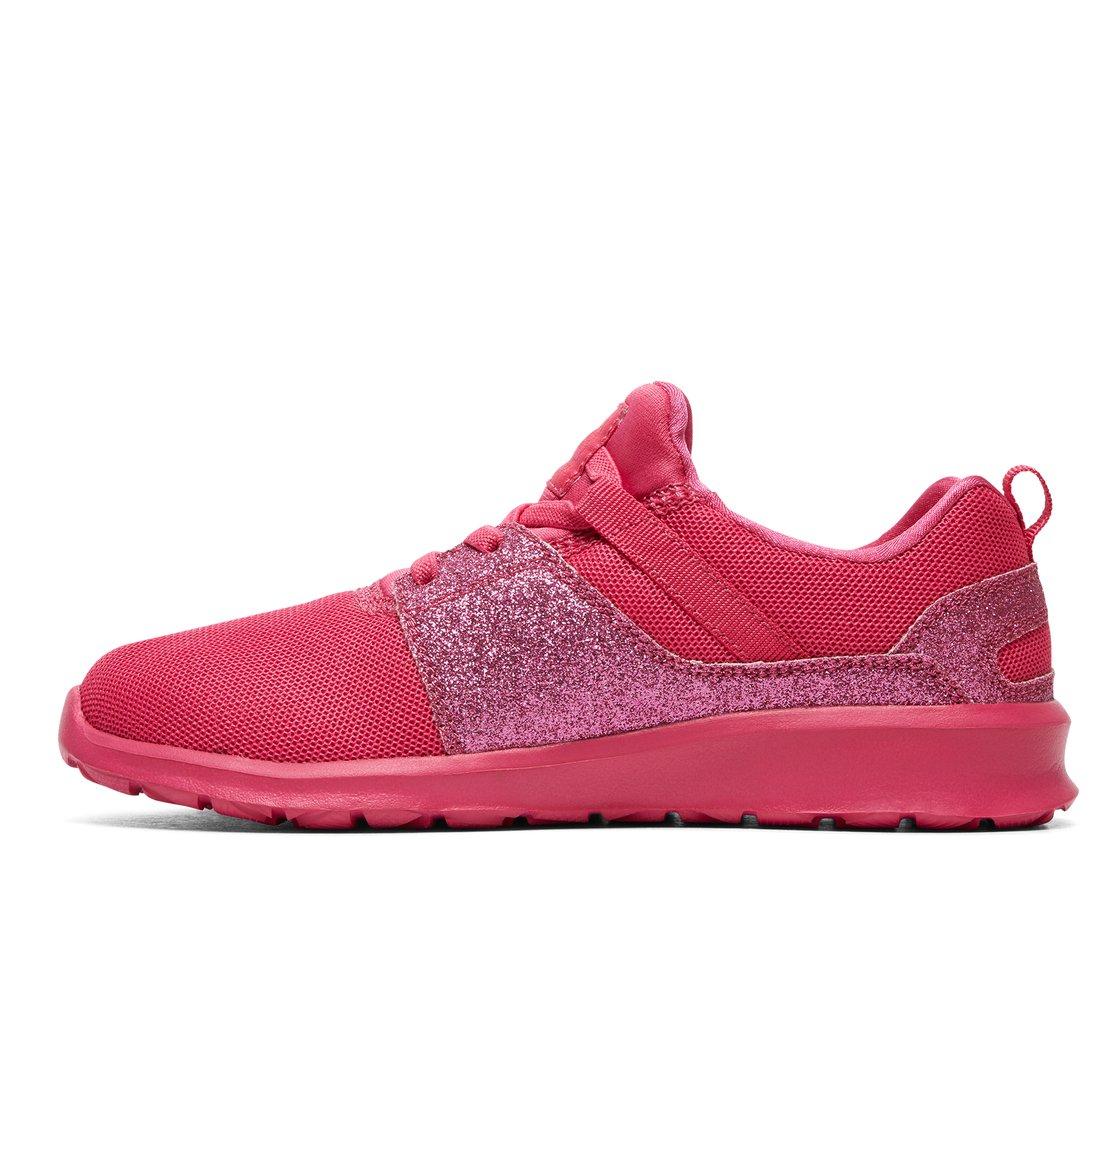 ca67f28ebd61 2 Girl s 8-16 Heathrow SE Shoes Pink ADGS700018 DC Shoes